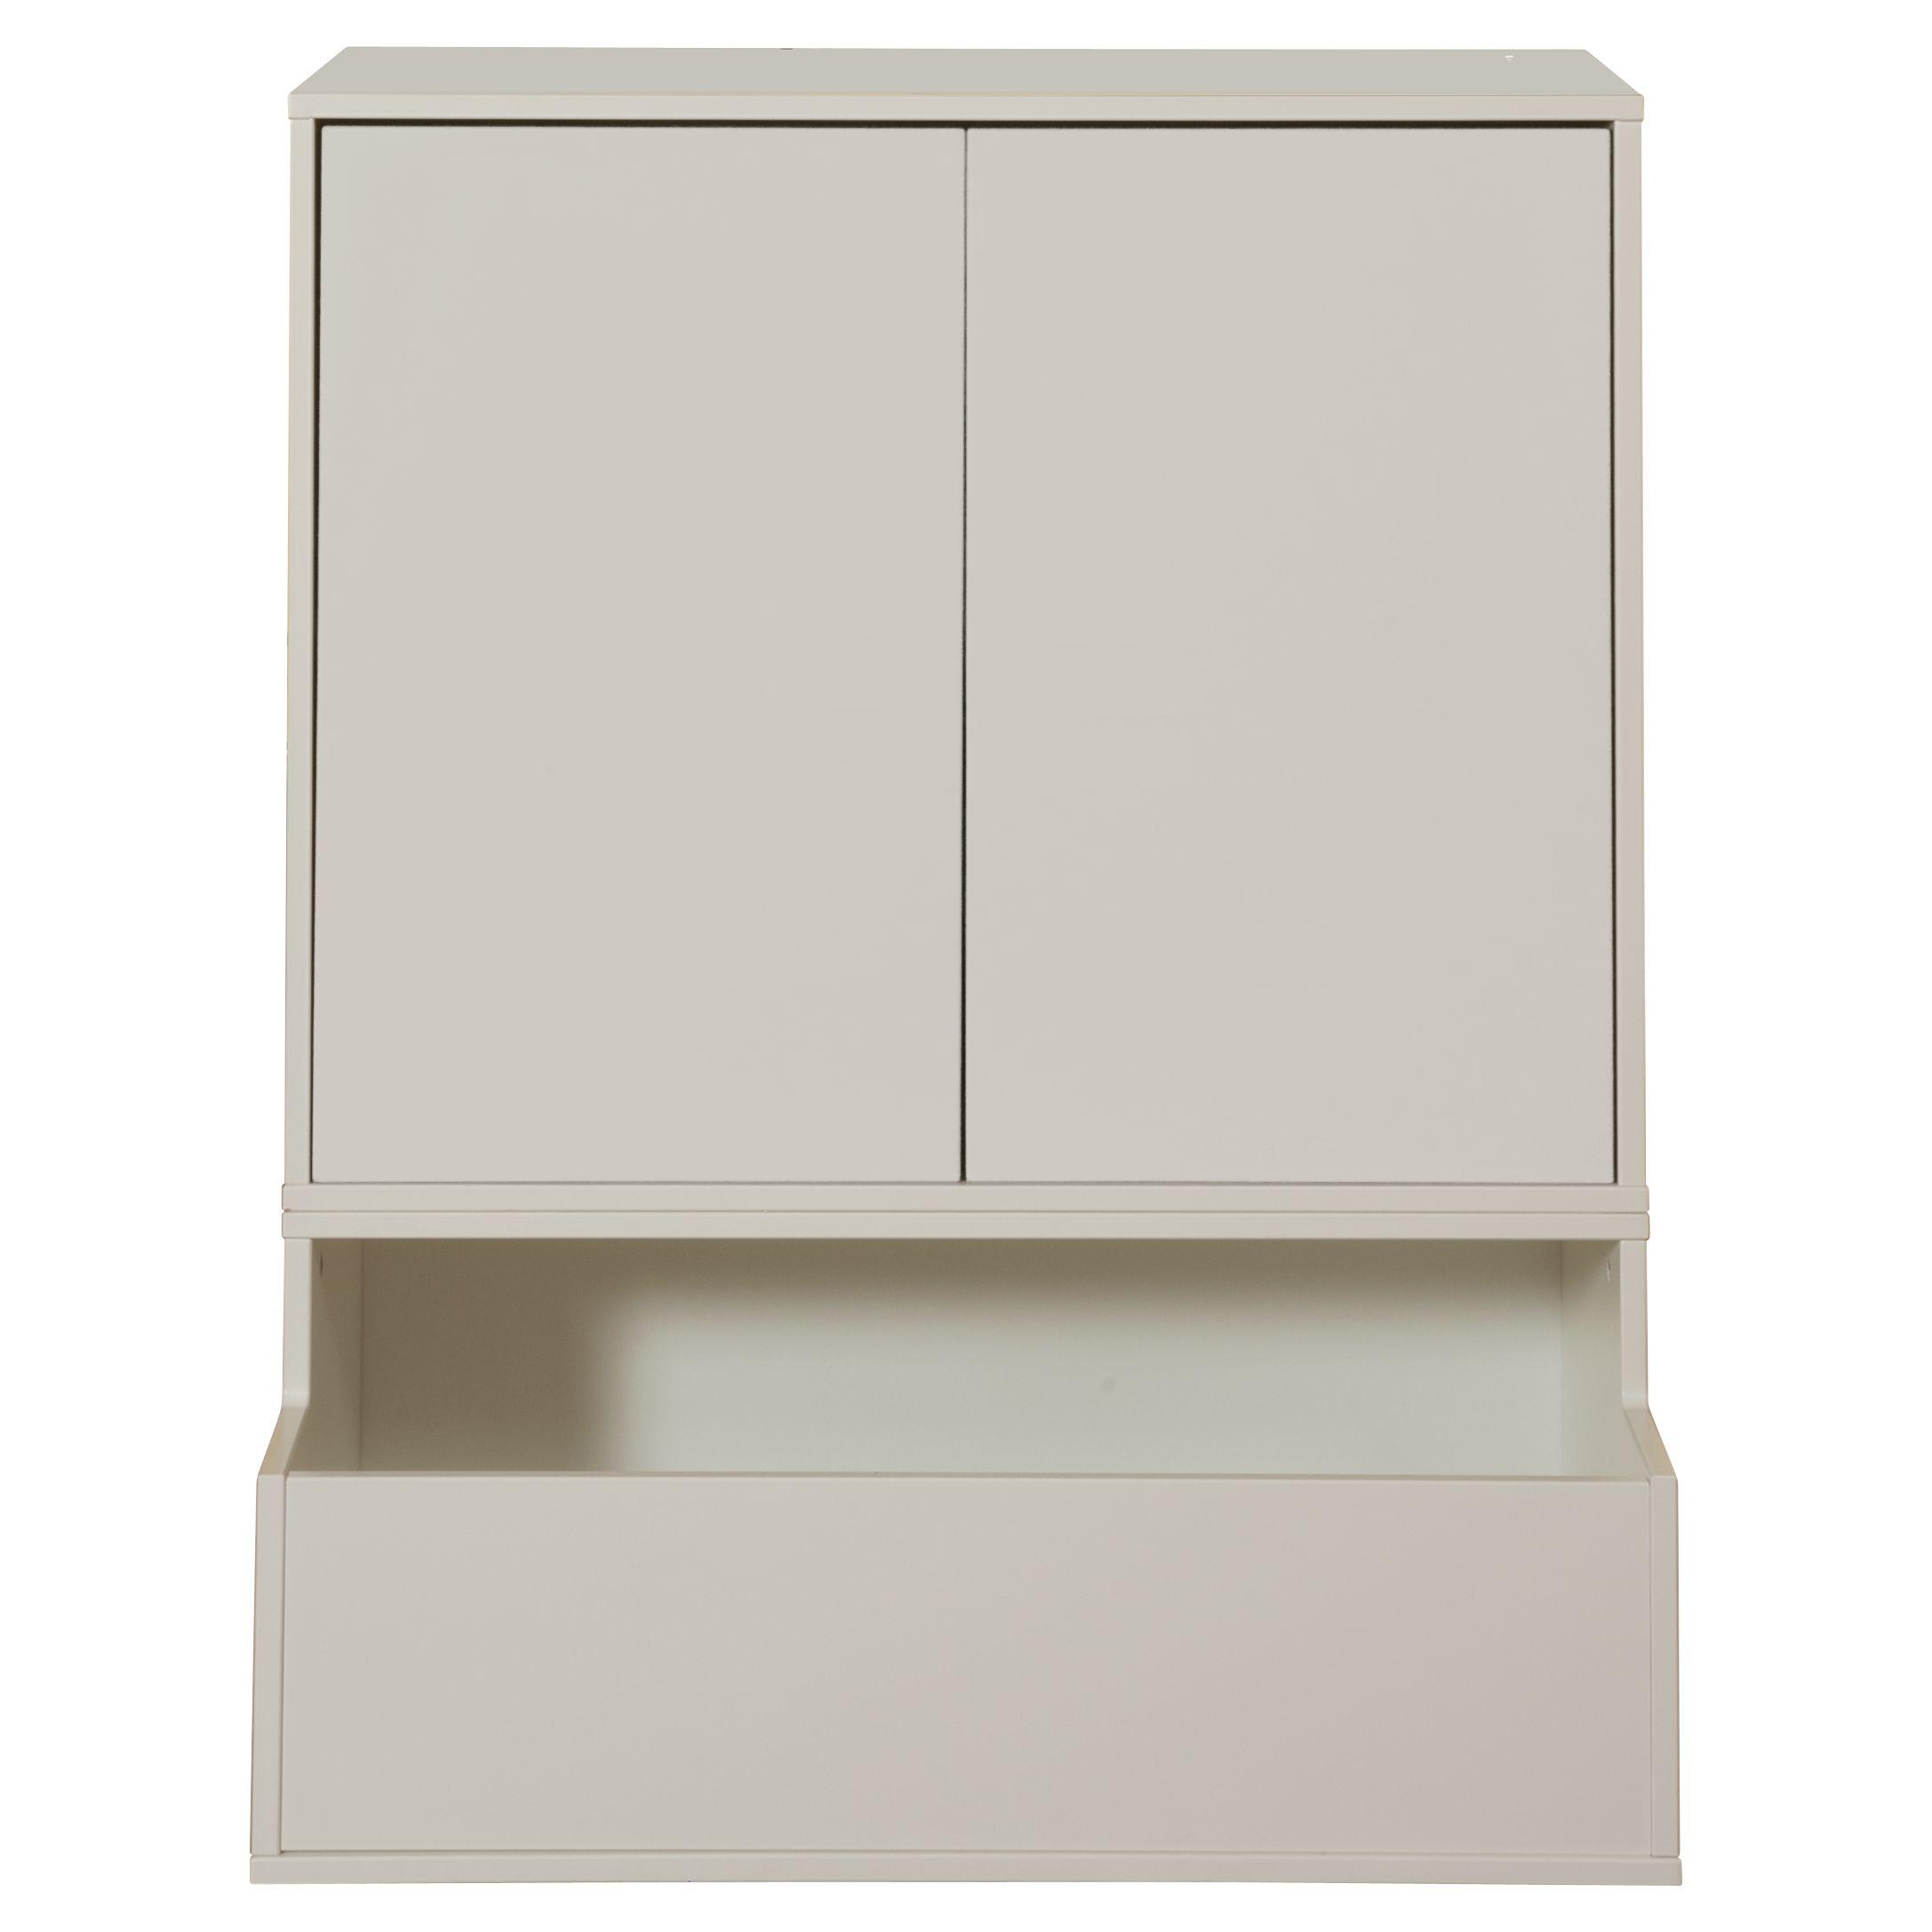 Stompa Stompa Uno S Plus 2 Door Storage Combination, White